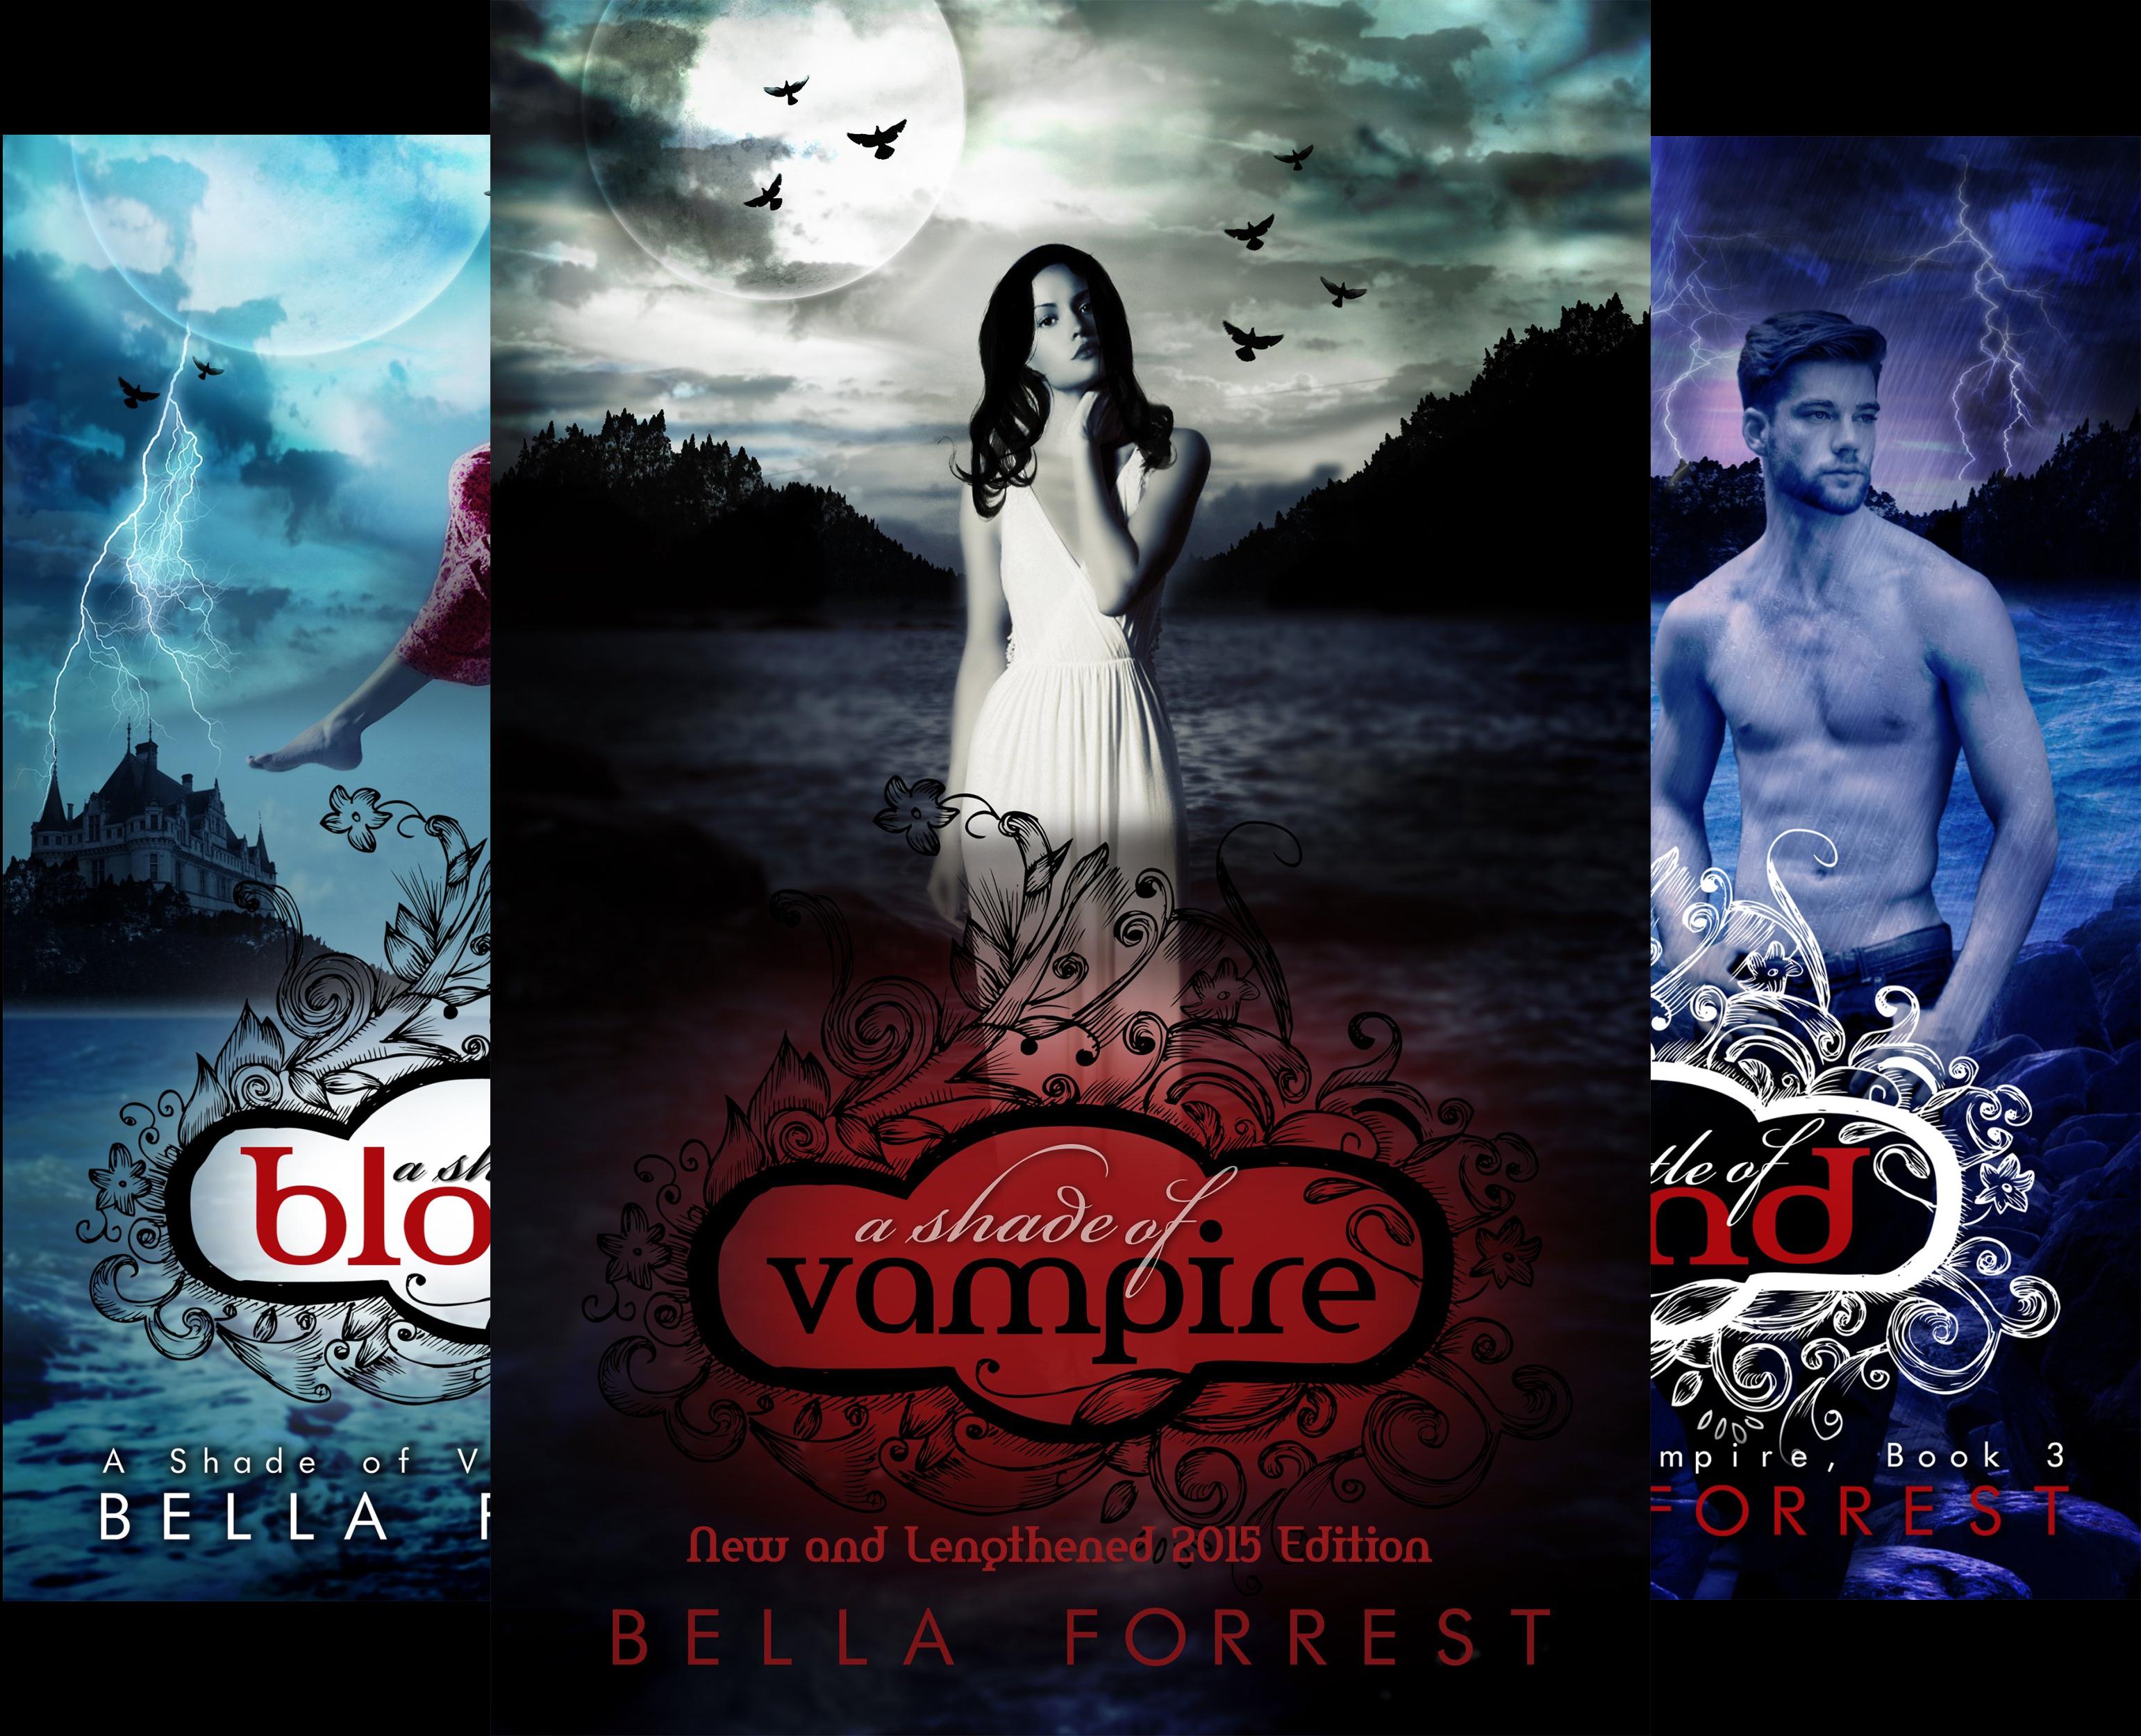 Mobilism ~ Download epub: a shade of vampire 18 book series free book epub